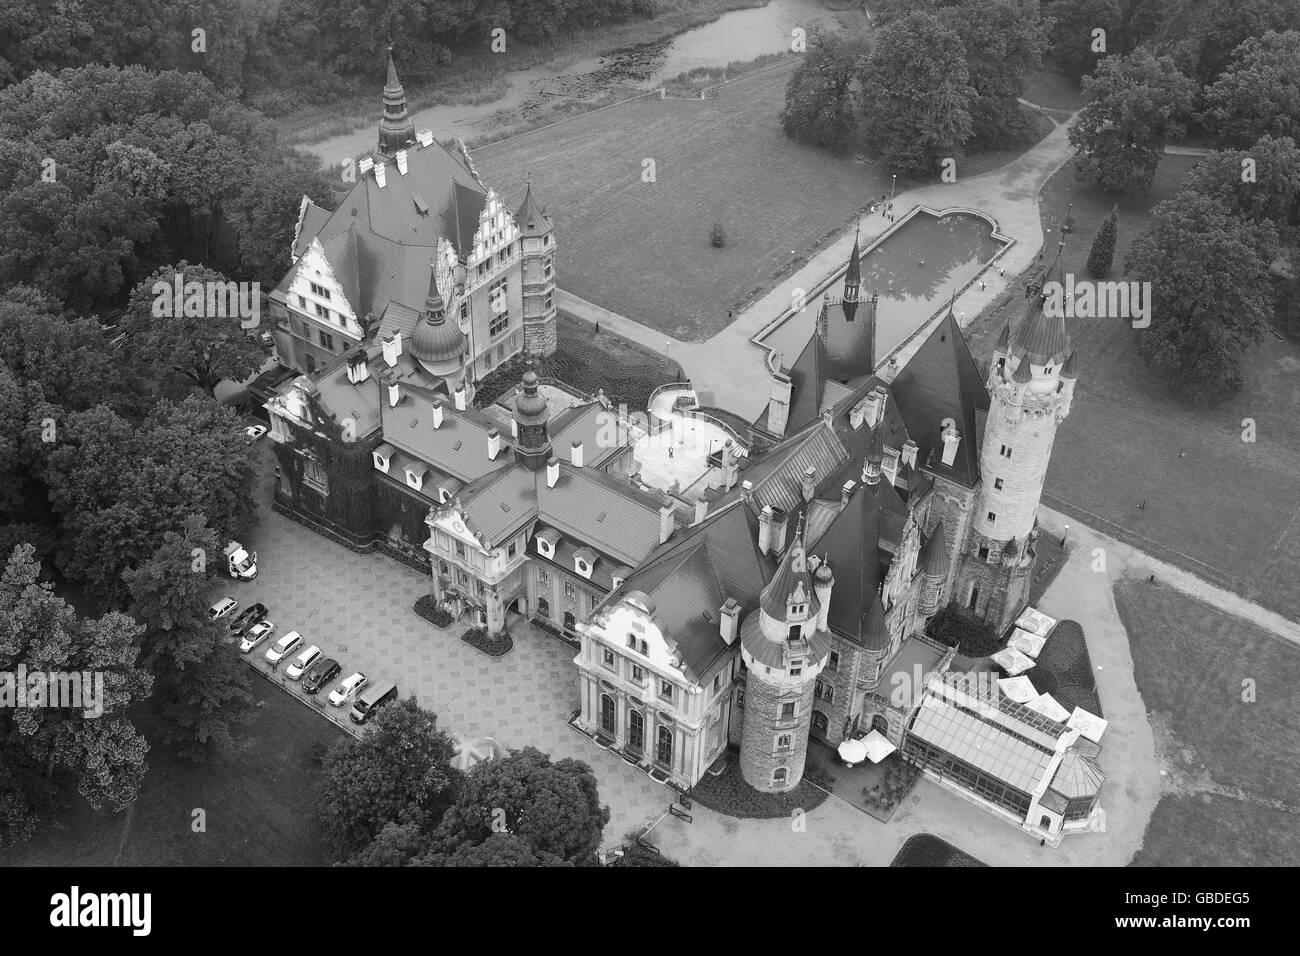 MOSZNA CASTLE (aerial view). Voivodeship of Opole, Poland. - Stock Image